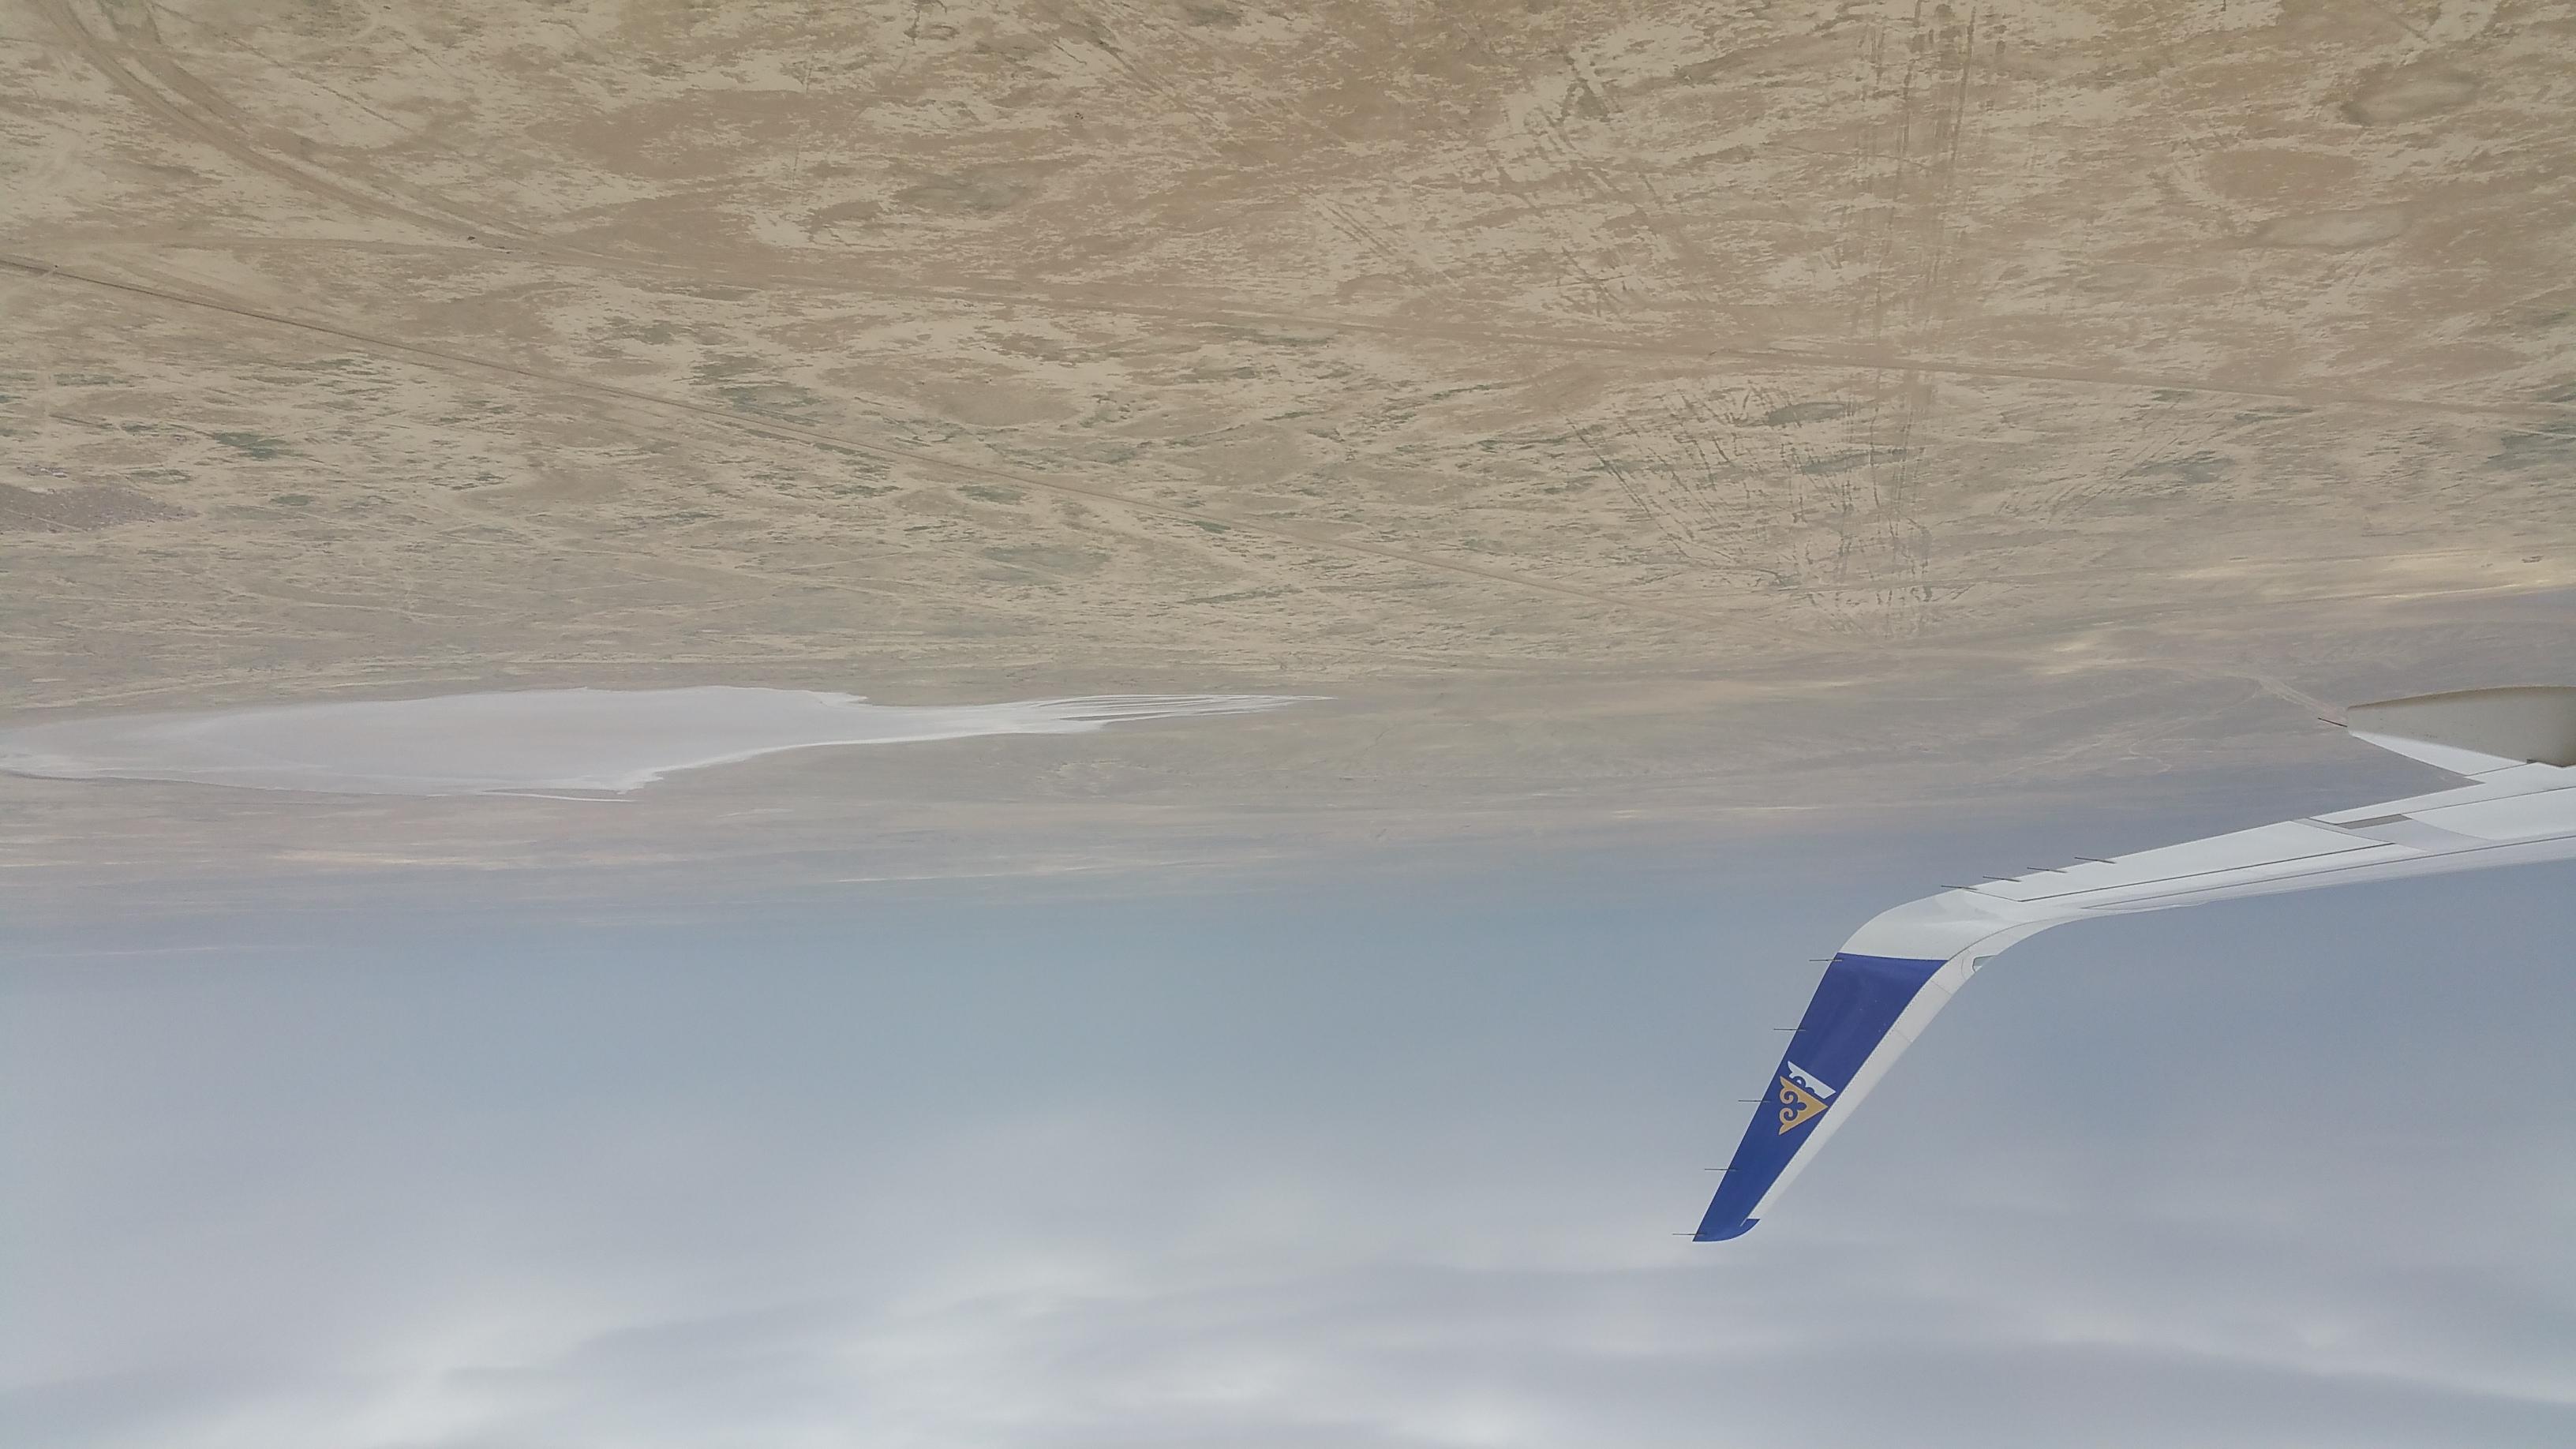 Descending to Aktau, Kazakhstan (May, 2015)